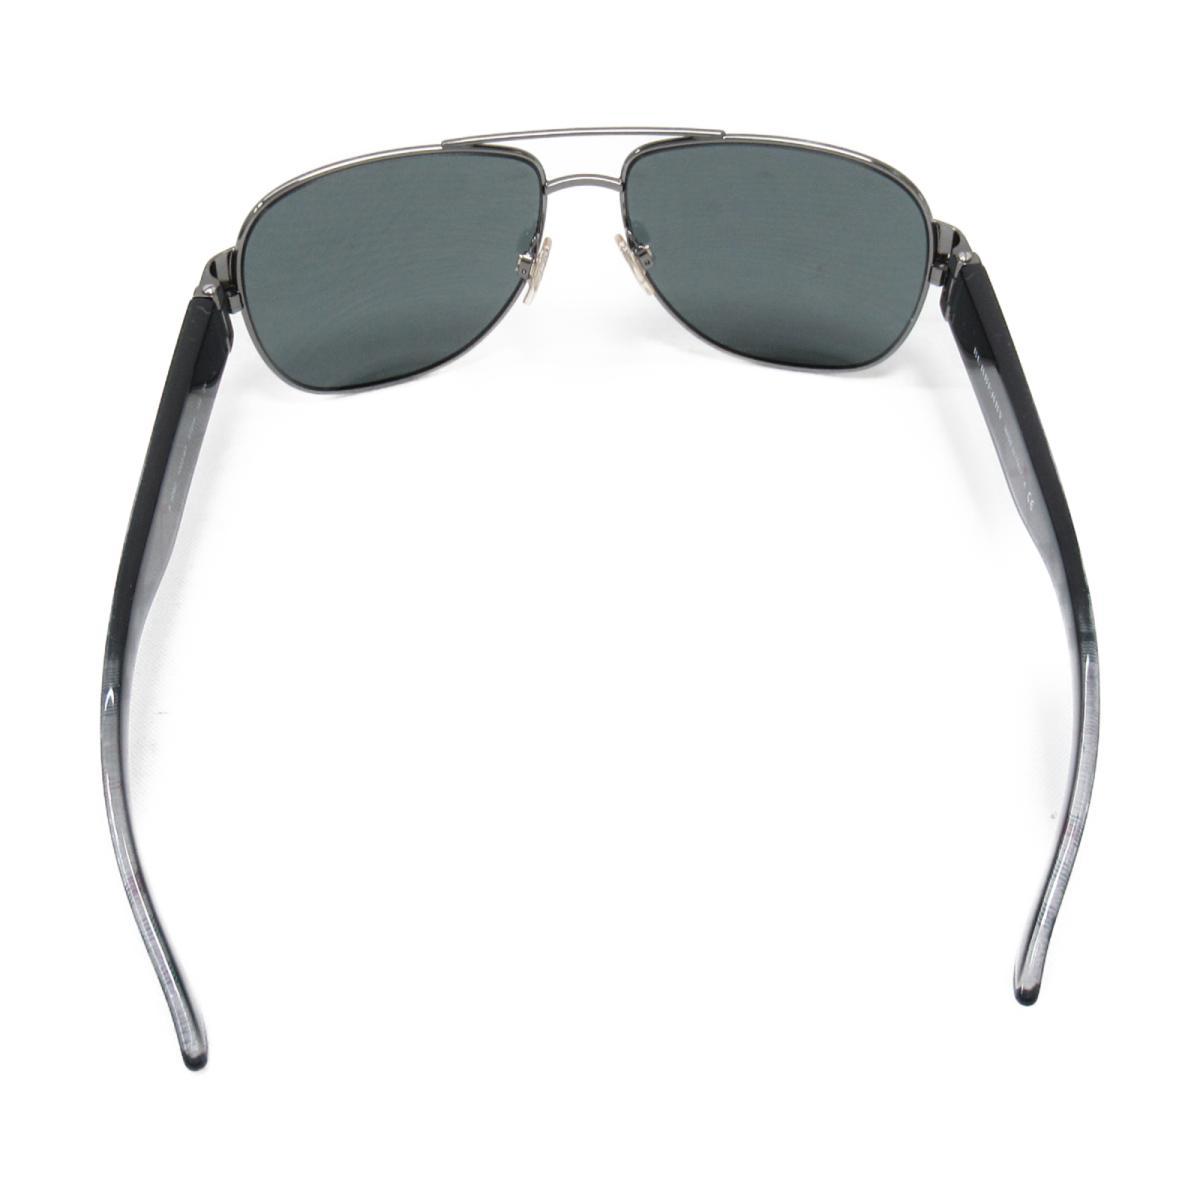 1876dc967ab ... Burberry sunglasses accessories unisex plastic black system (B3042  1003/87) ...